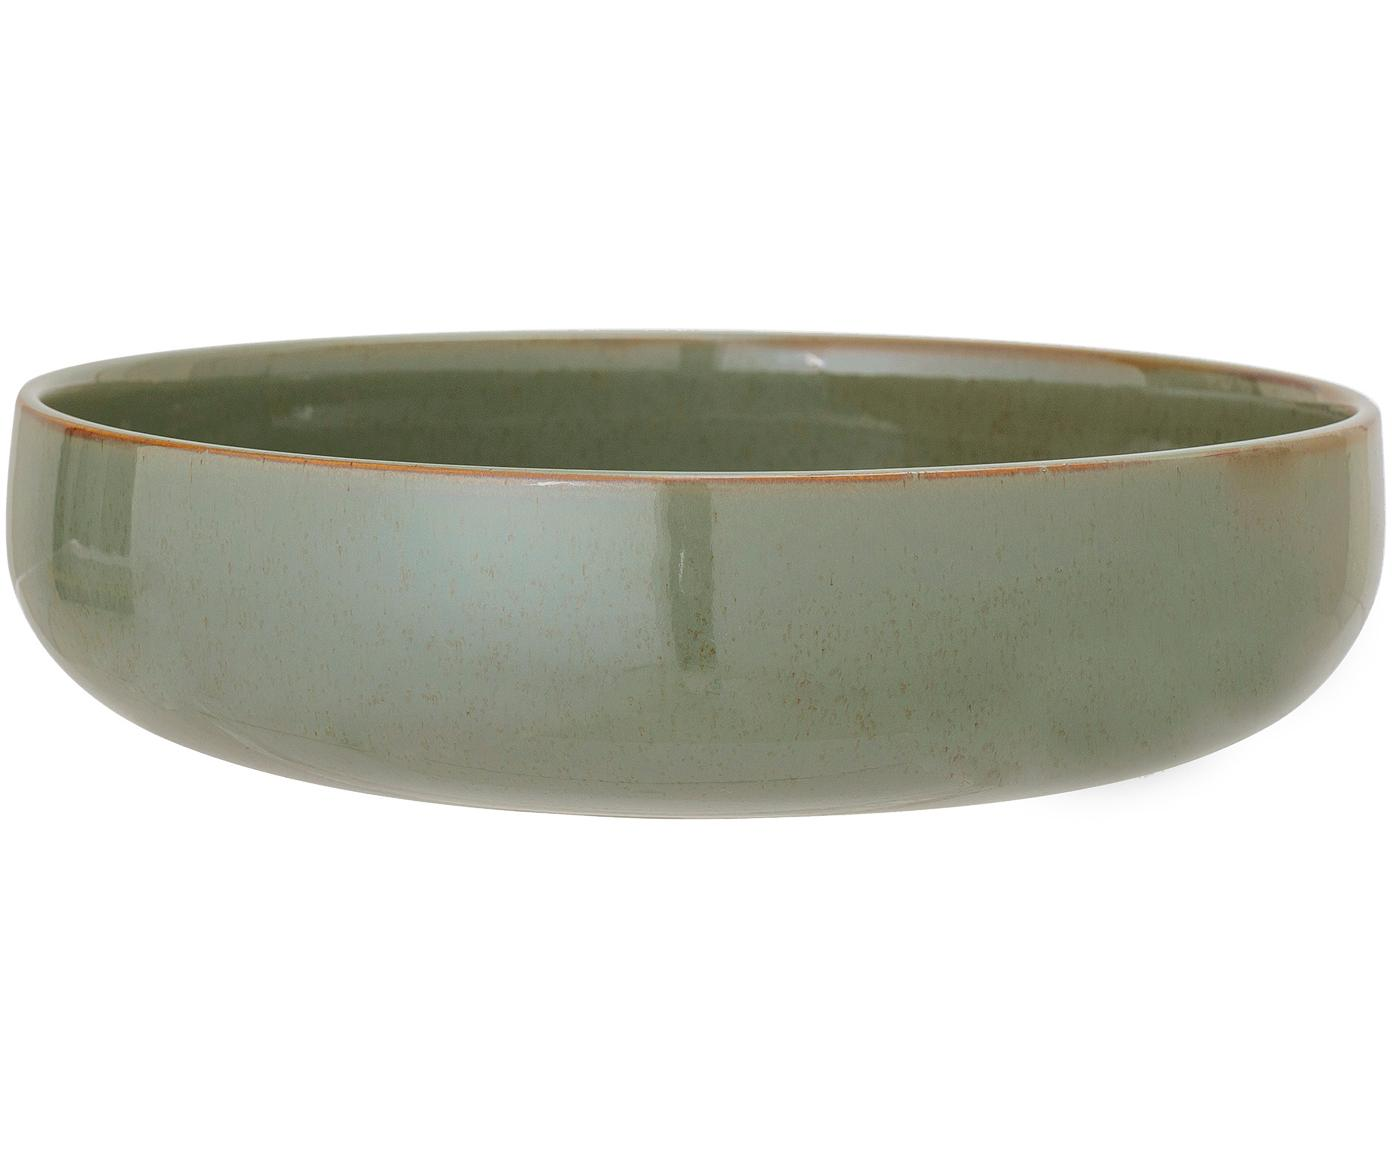 Ciotola da servizio Pixie, Terracotta, Toni verdi, Ø 28 x A 7 cm